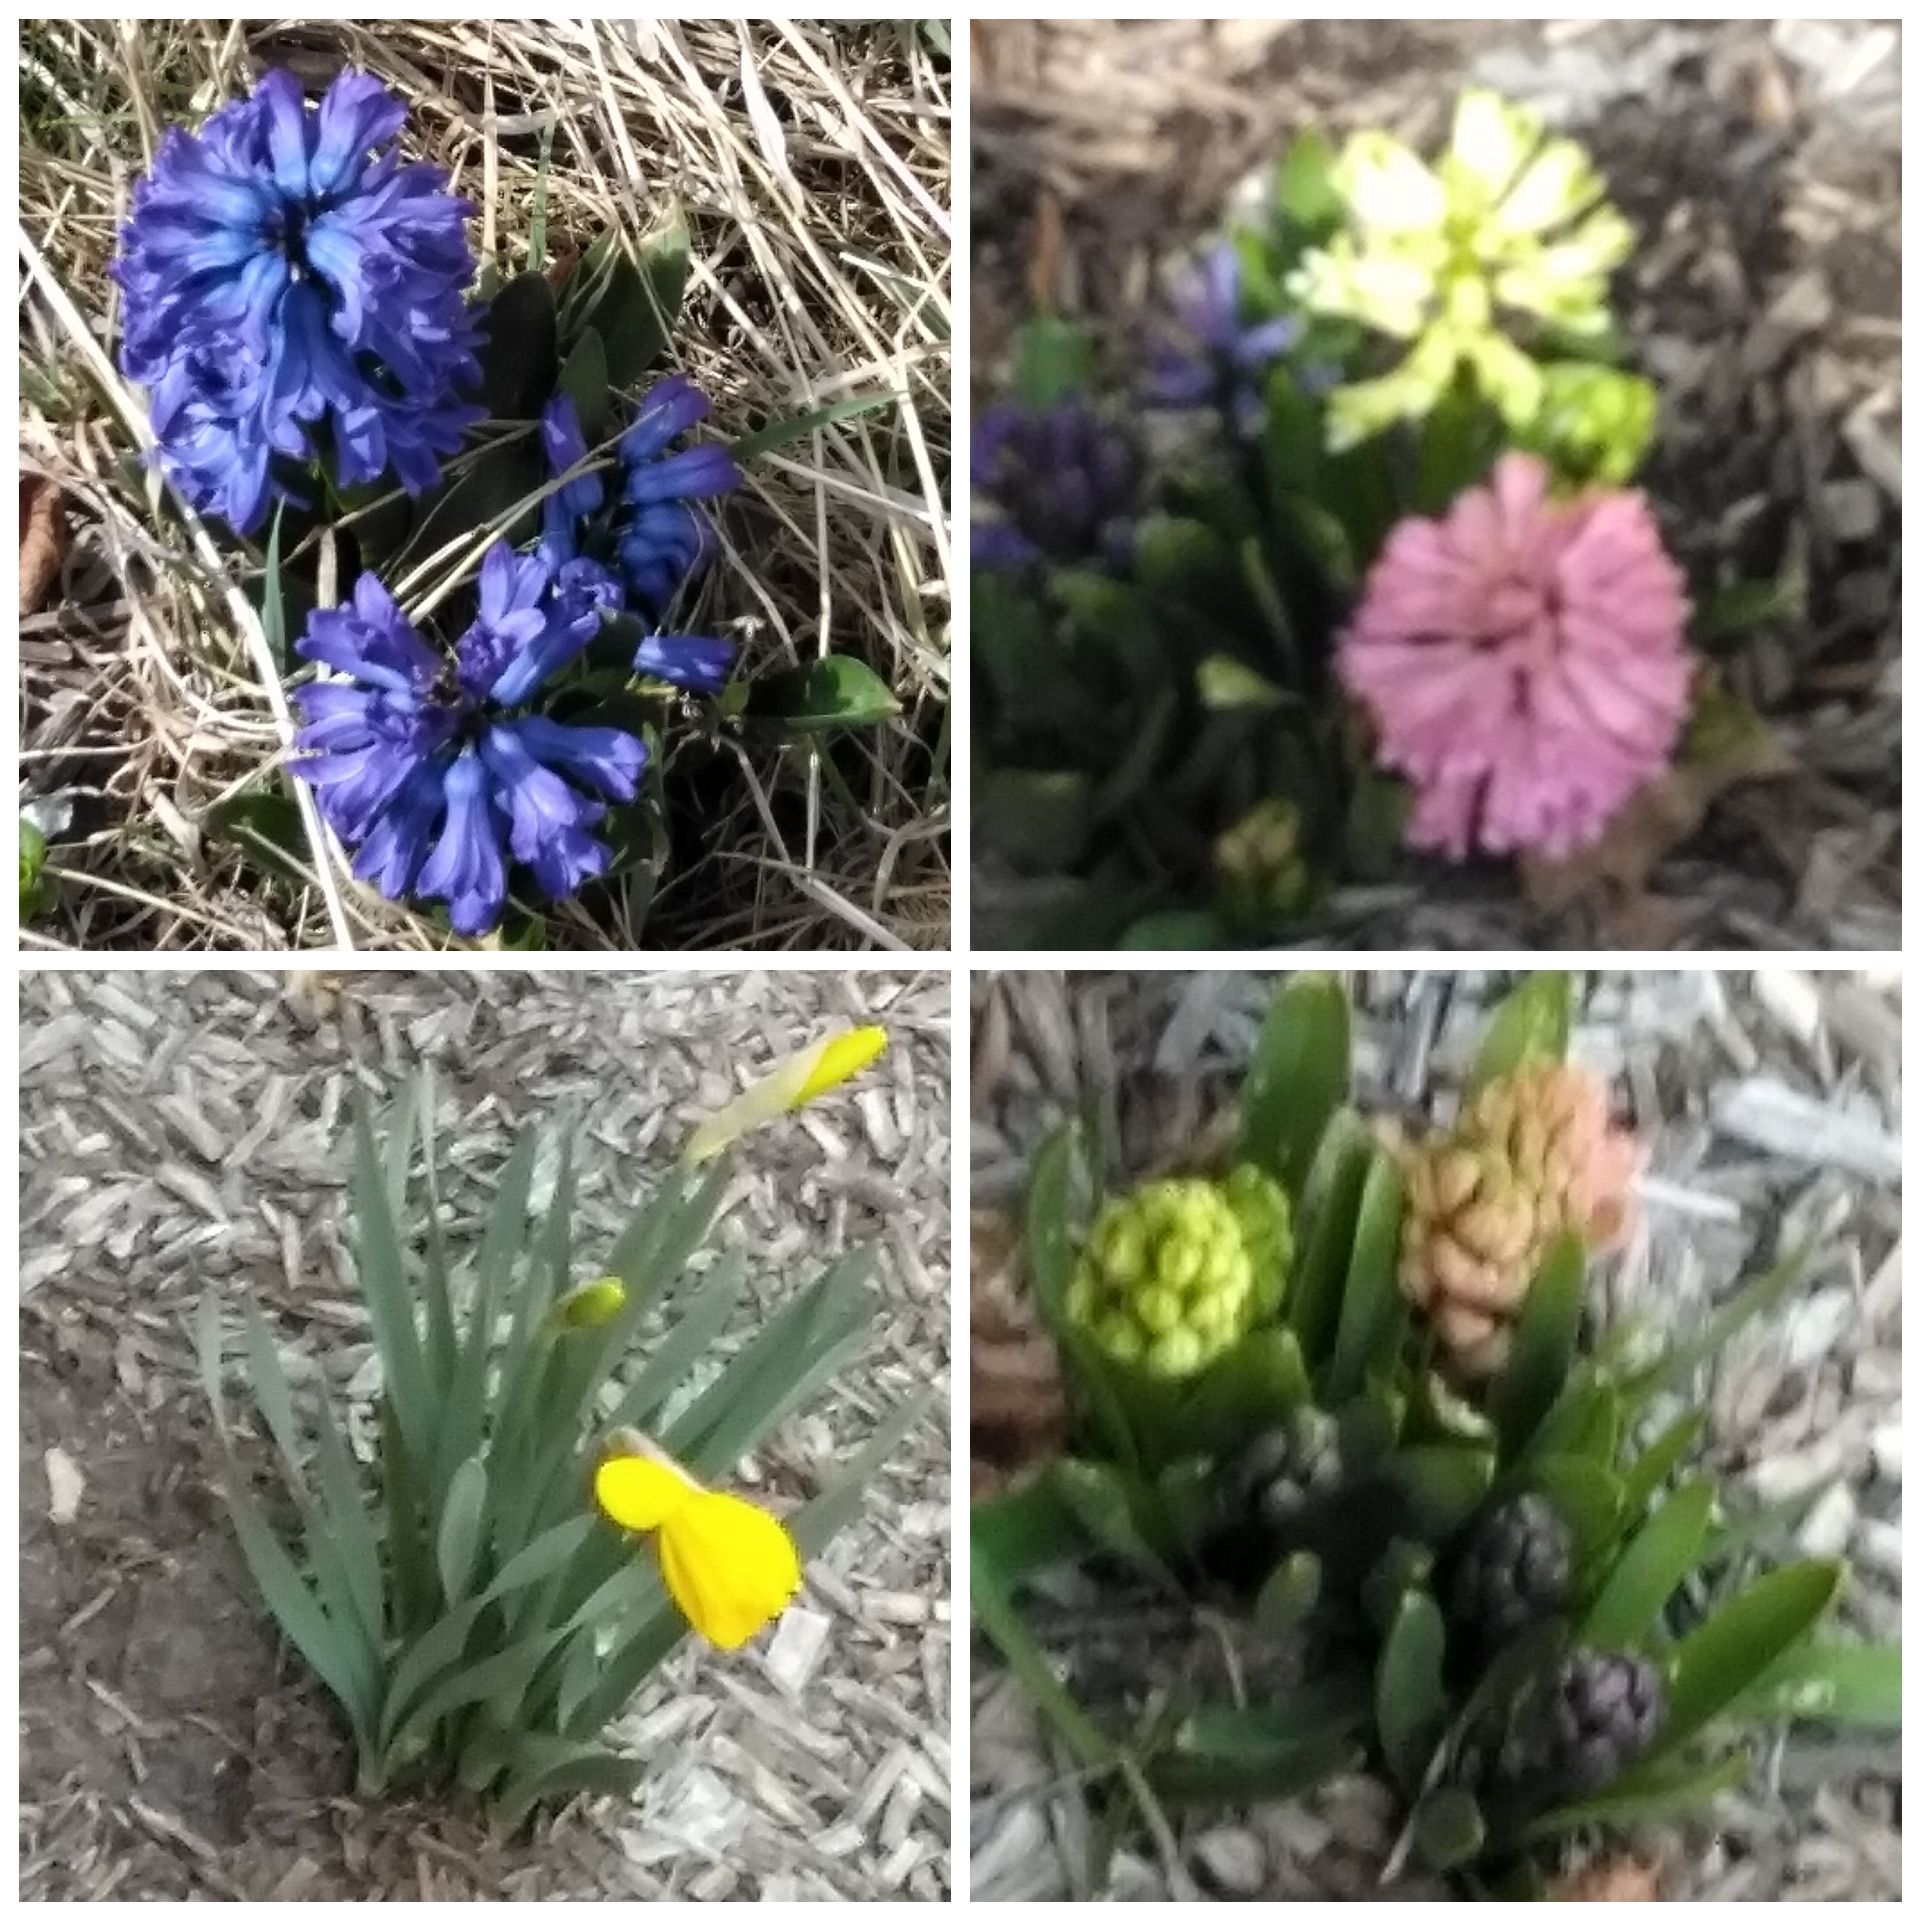 My spring flowers